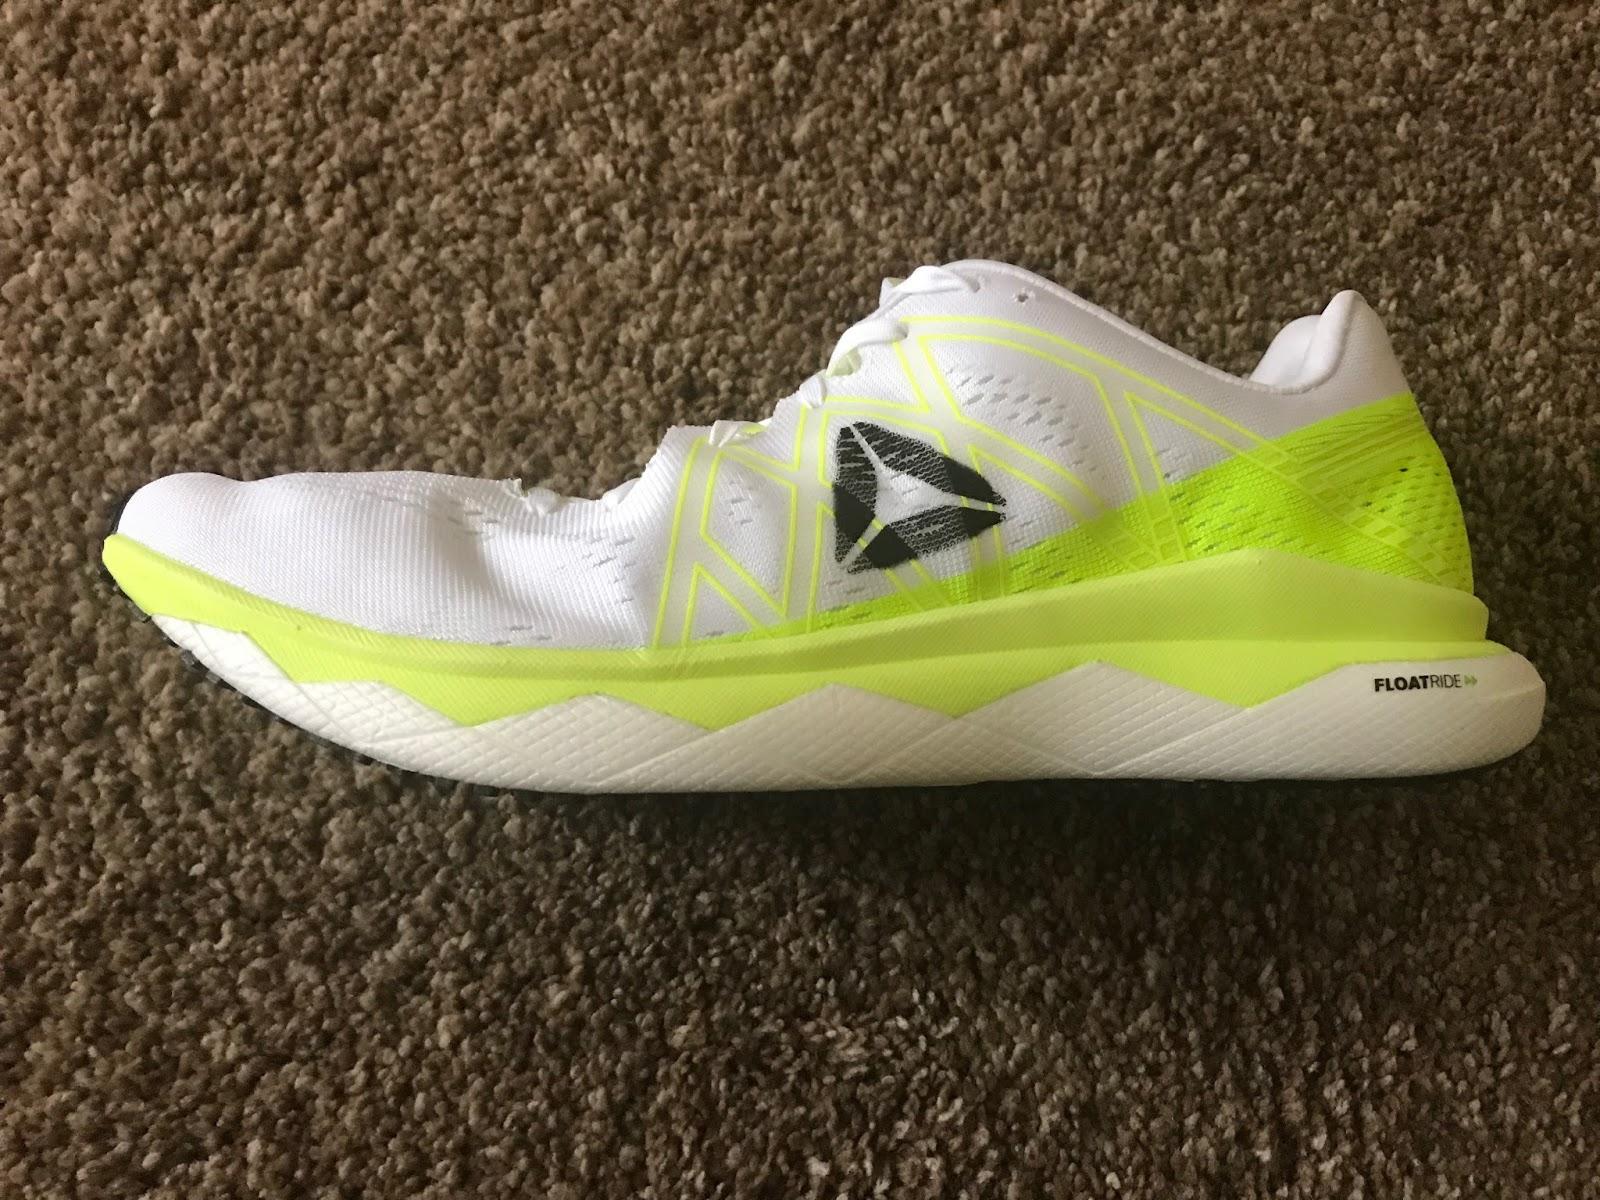 separation shoes 678a6 e4ddd Road Trail Run: Reebok Floatride Run Fast Multi Tester ...